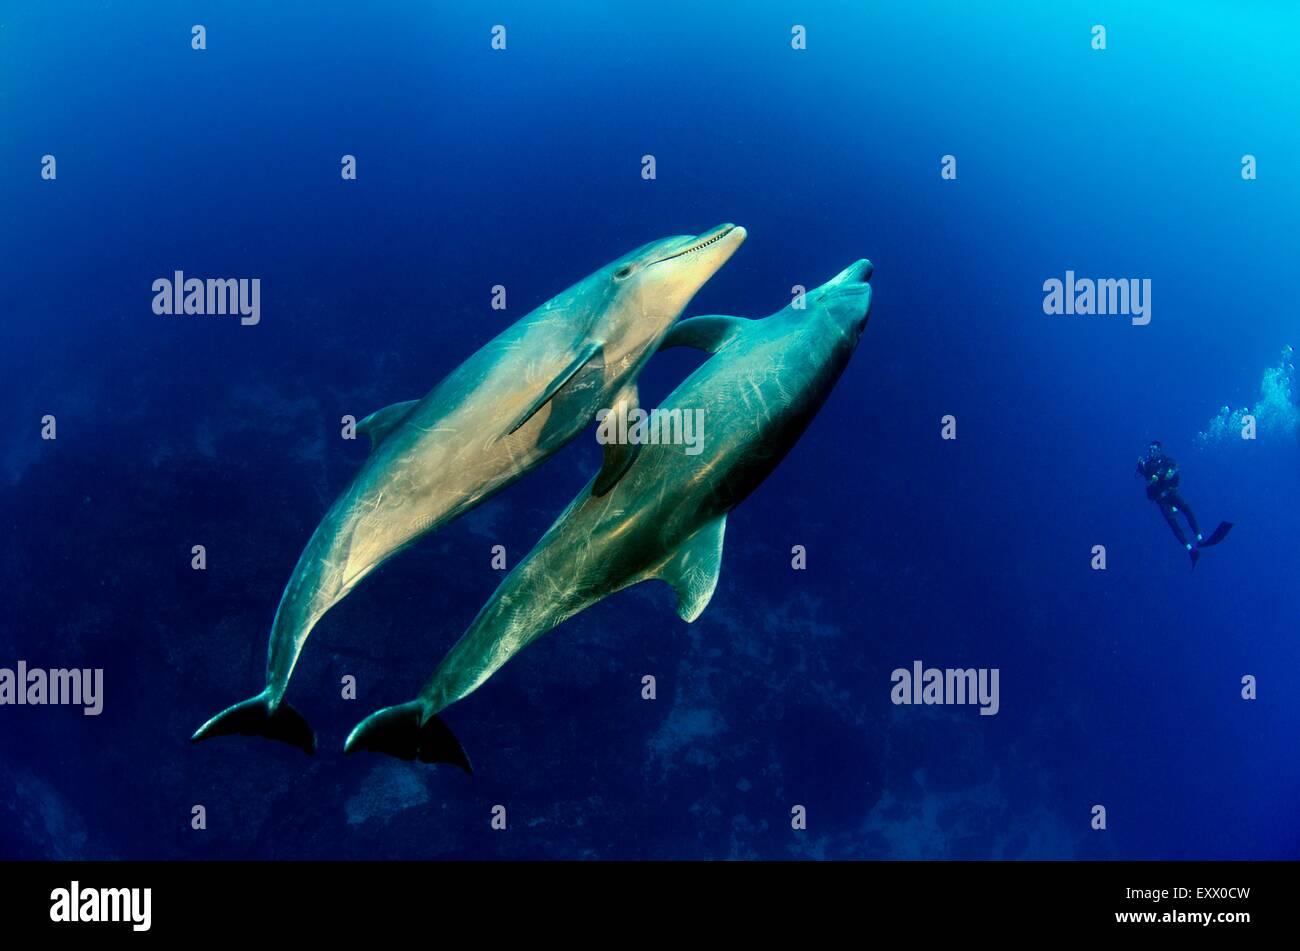 Two bottlenose dolphin, Tursiops truncatus, Socorro Islands, Mexico, America - Stock Image